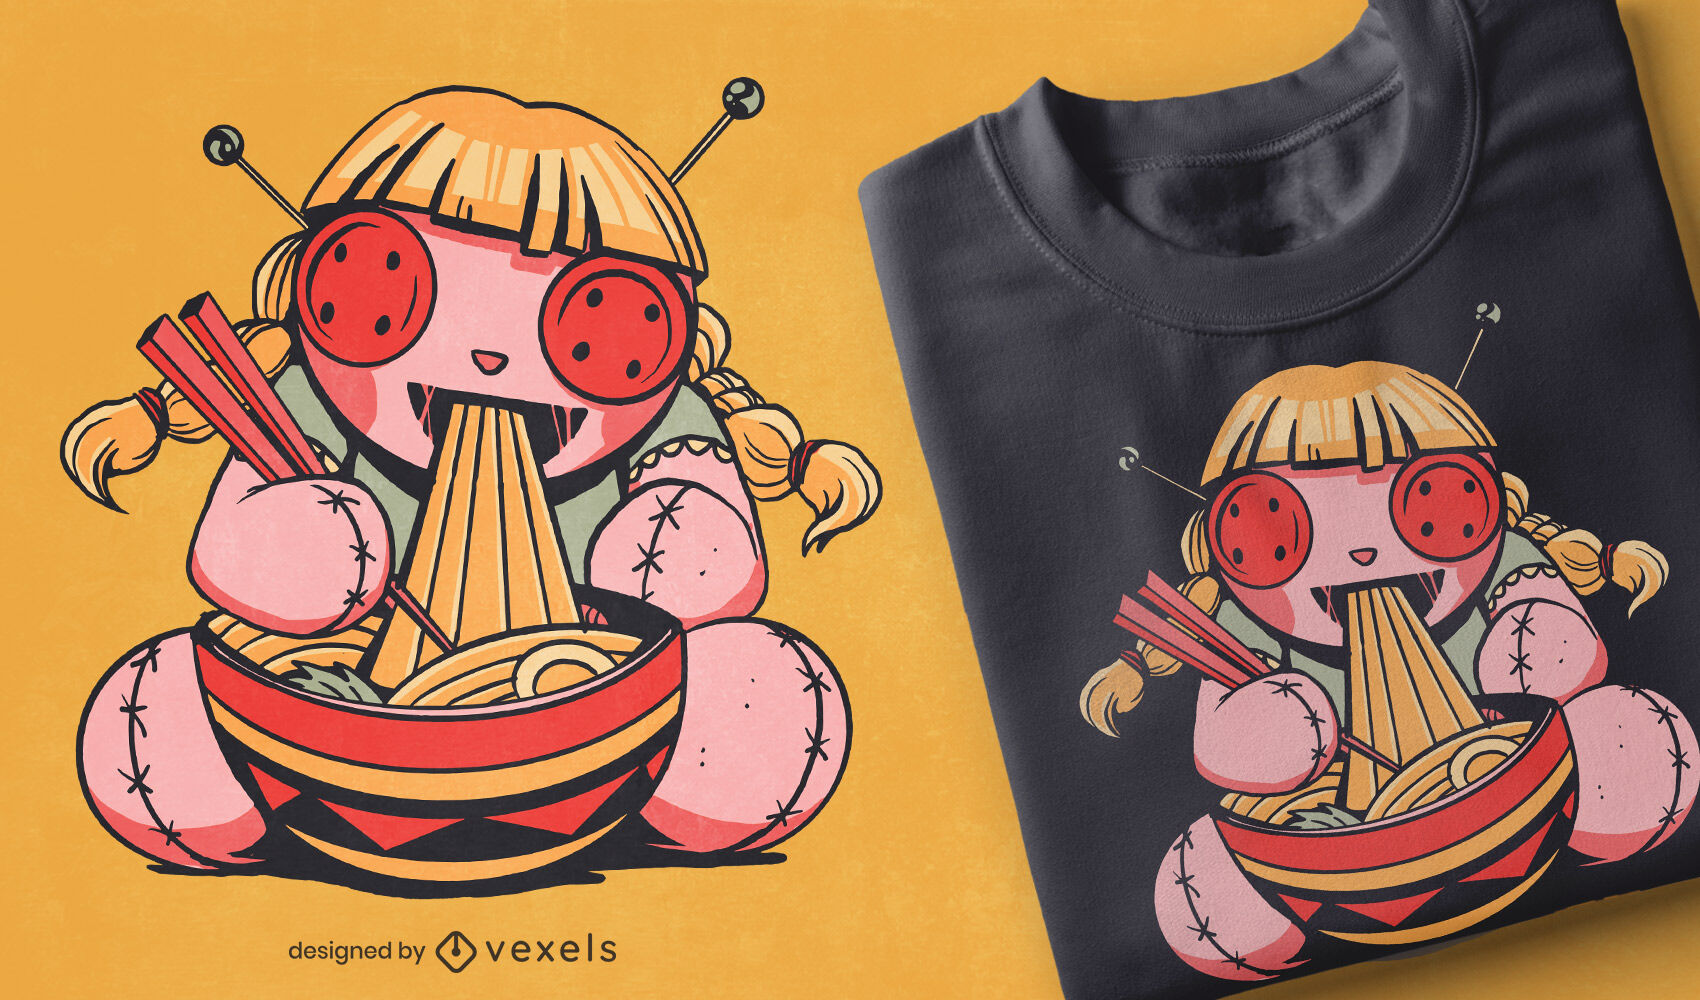 Voodoo-Puppe isst Spaghetti-T-Shirt-Design